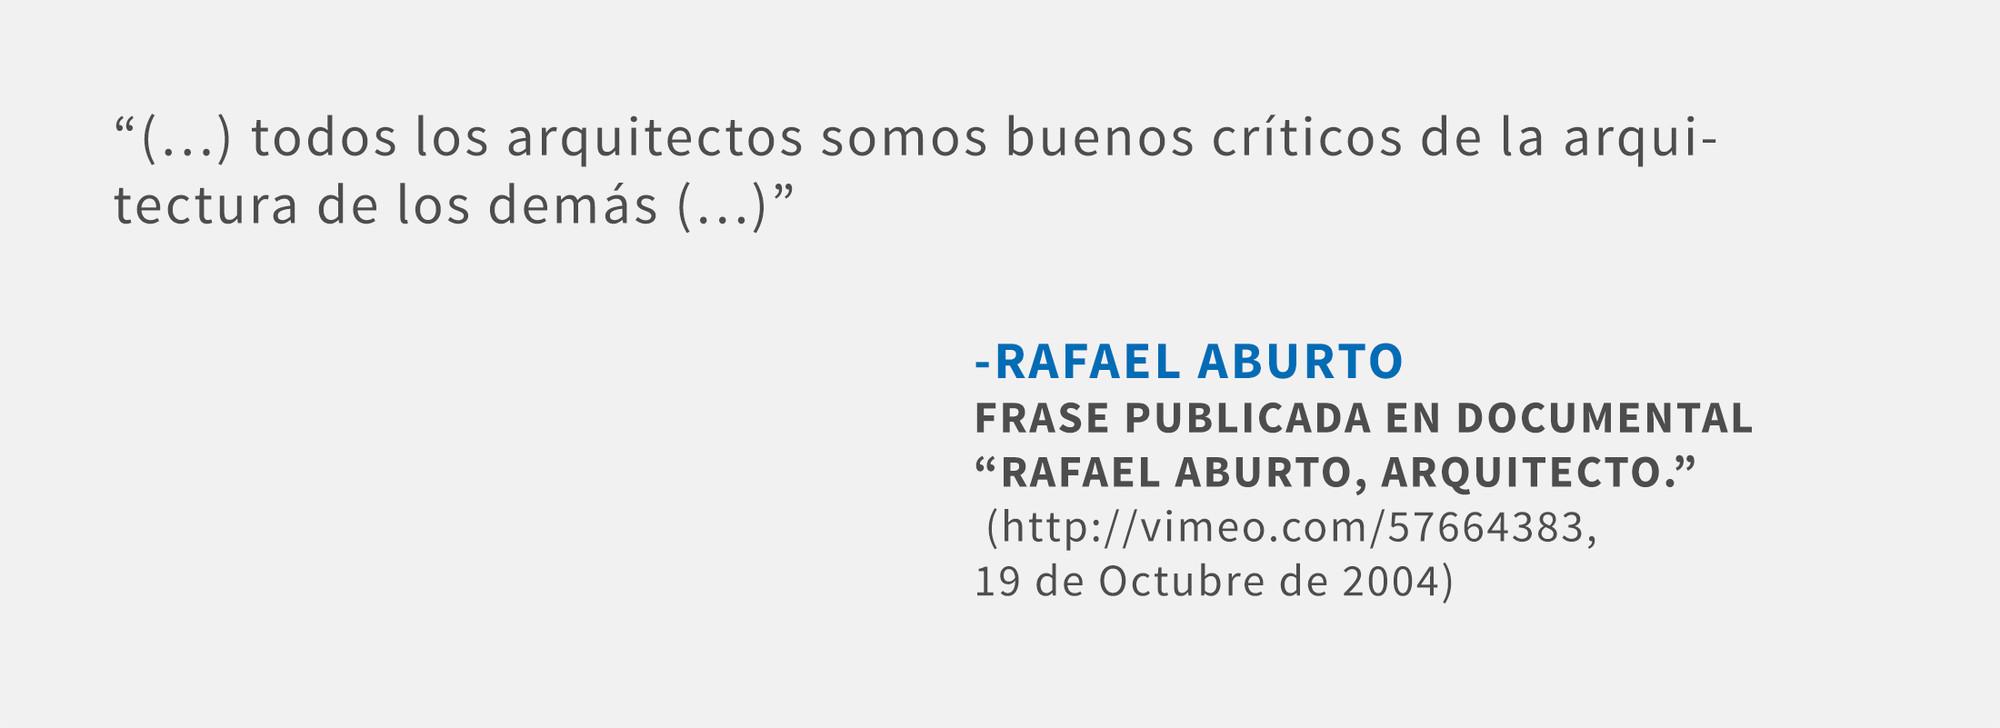 Frases: Rafael Aburto